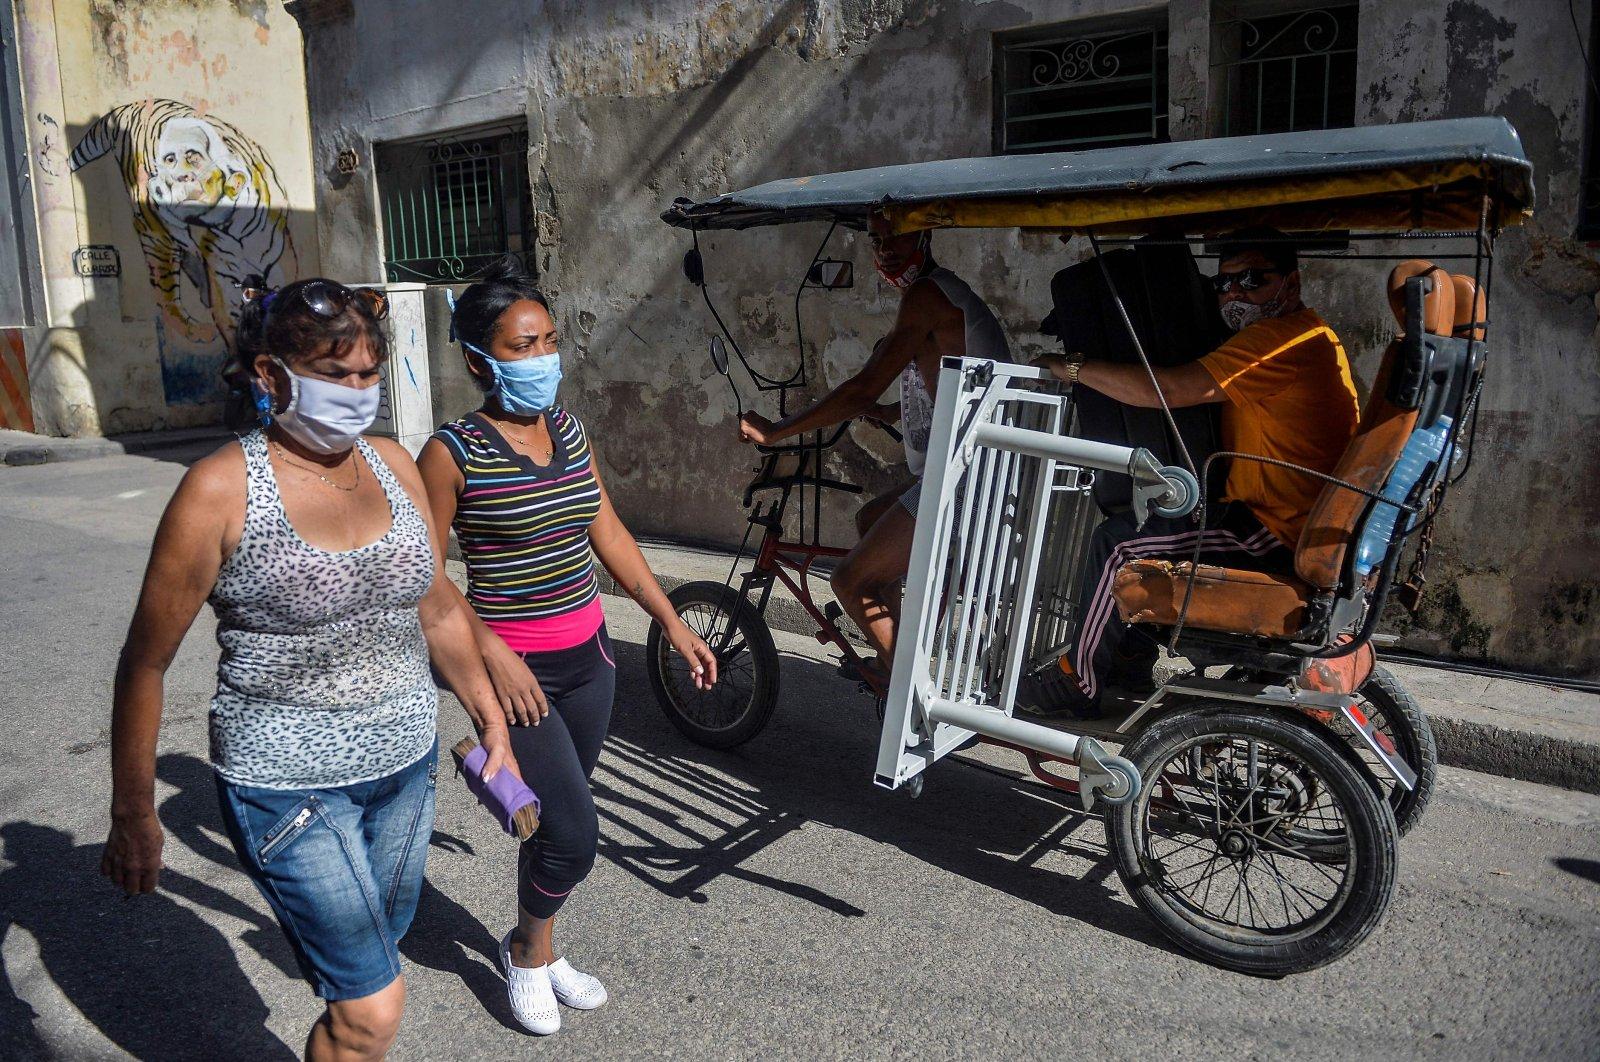 Women wearing masks walk along along a street. Havana, Cuba, on April 6, 2021. (AFP Photo)